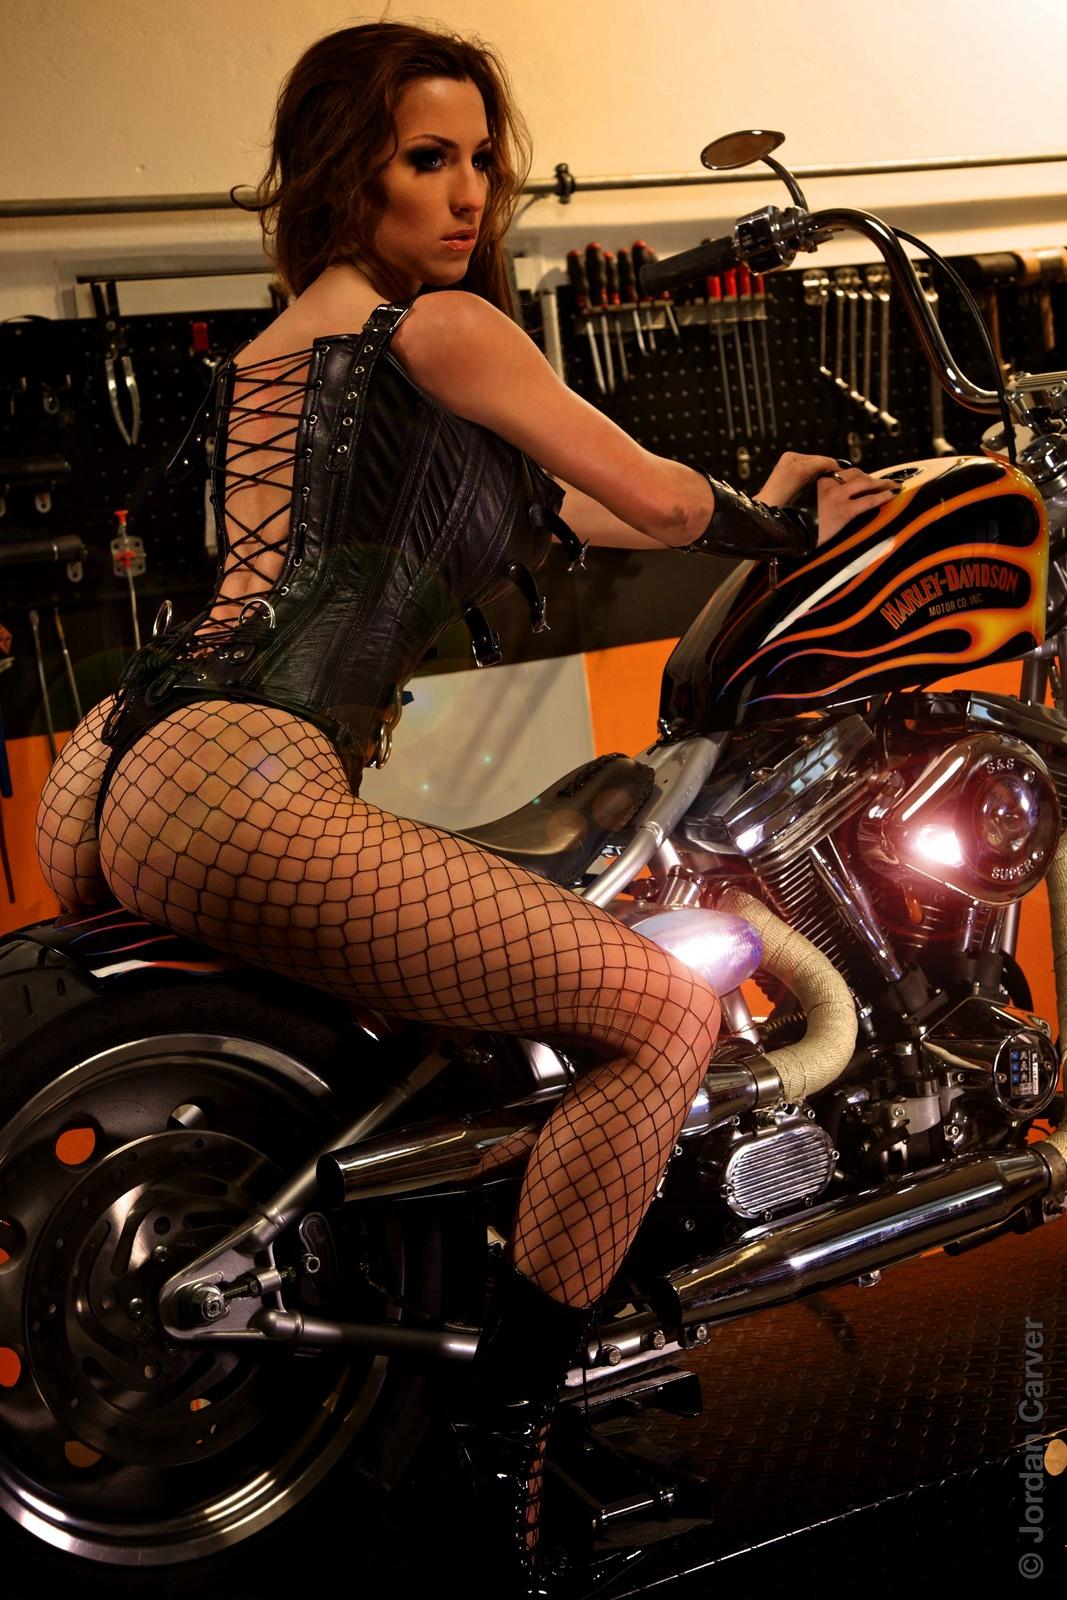 Jordan Carver Biker Girl I